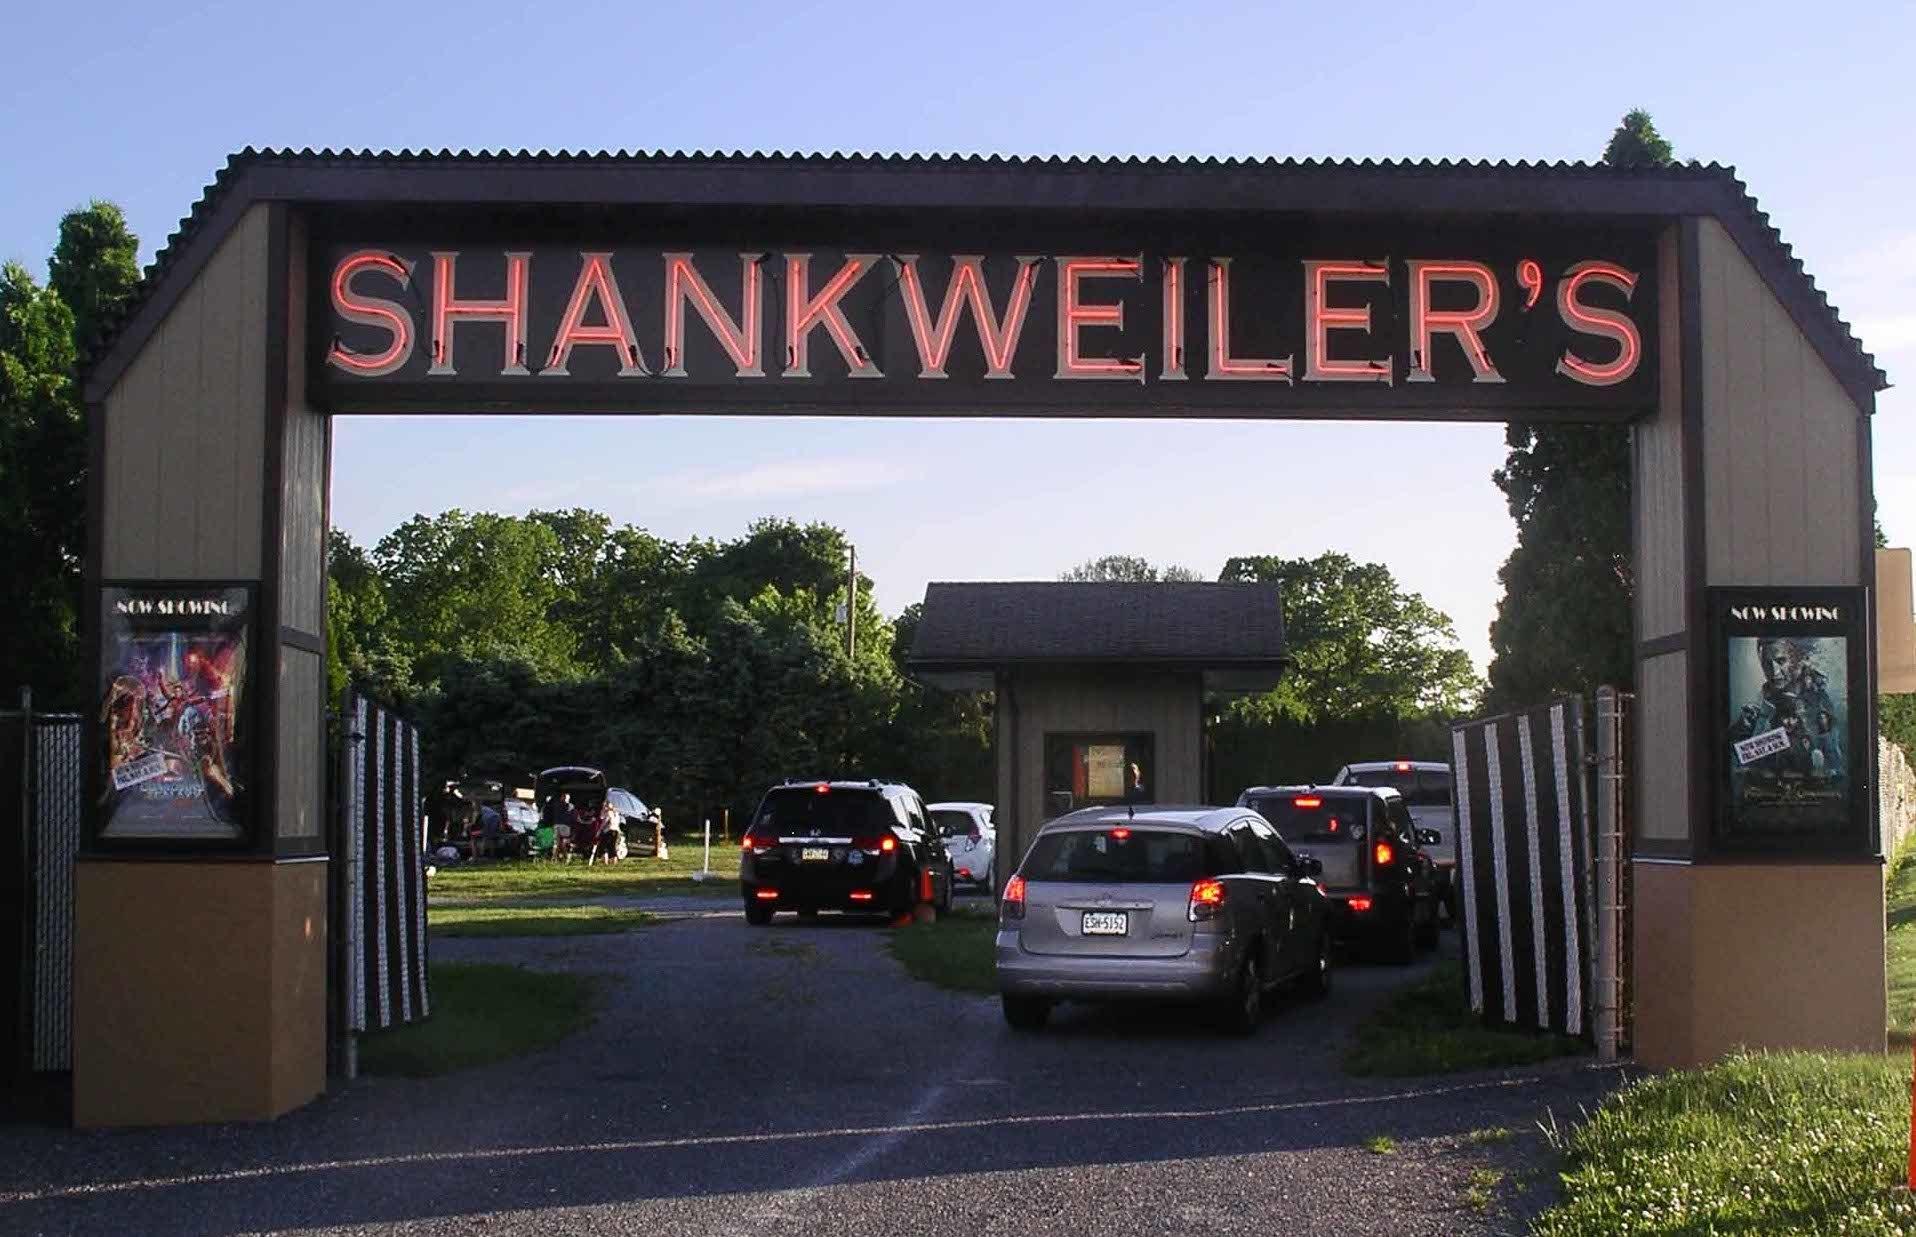 Drive In Shankweiler's